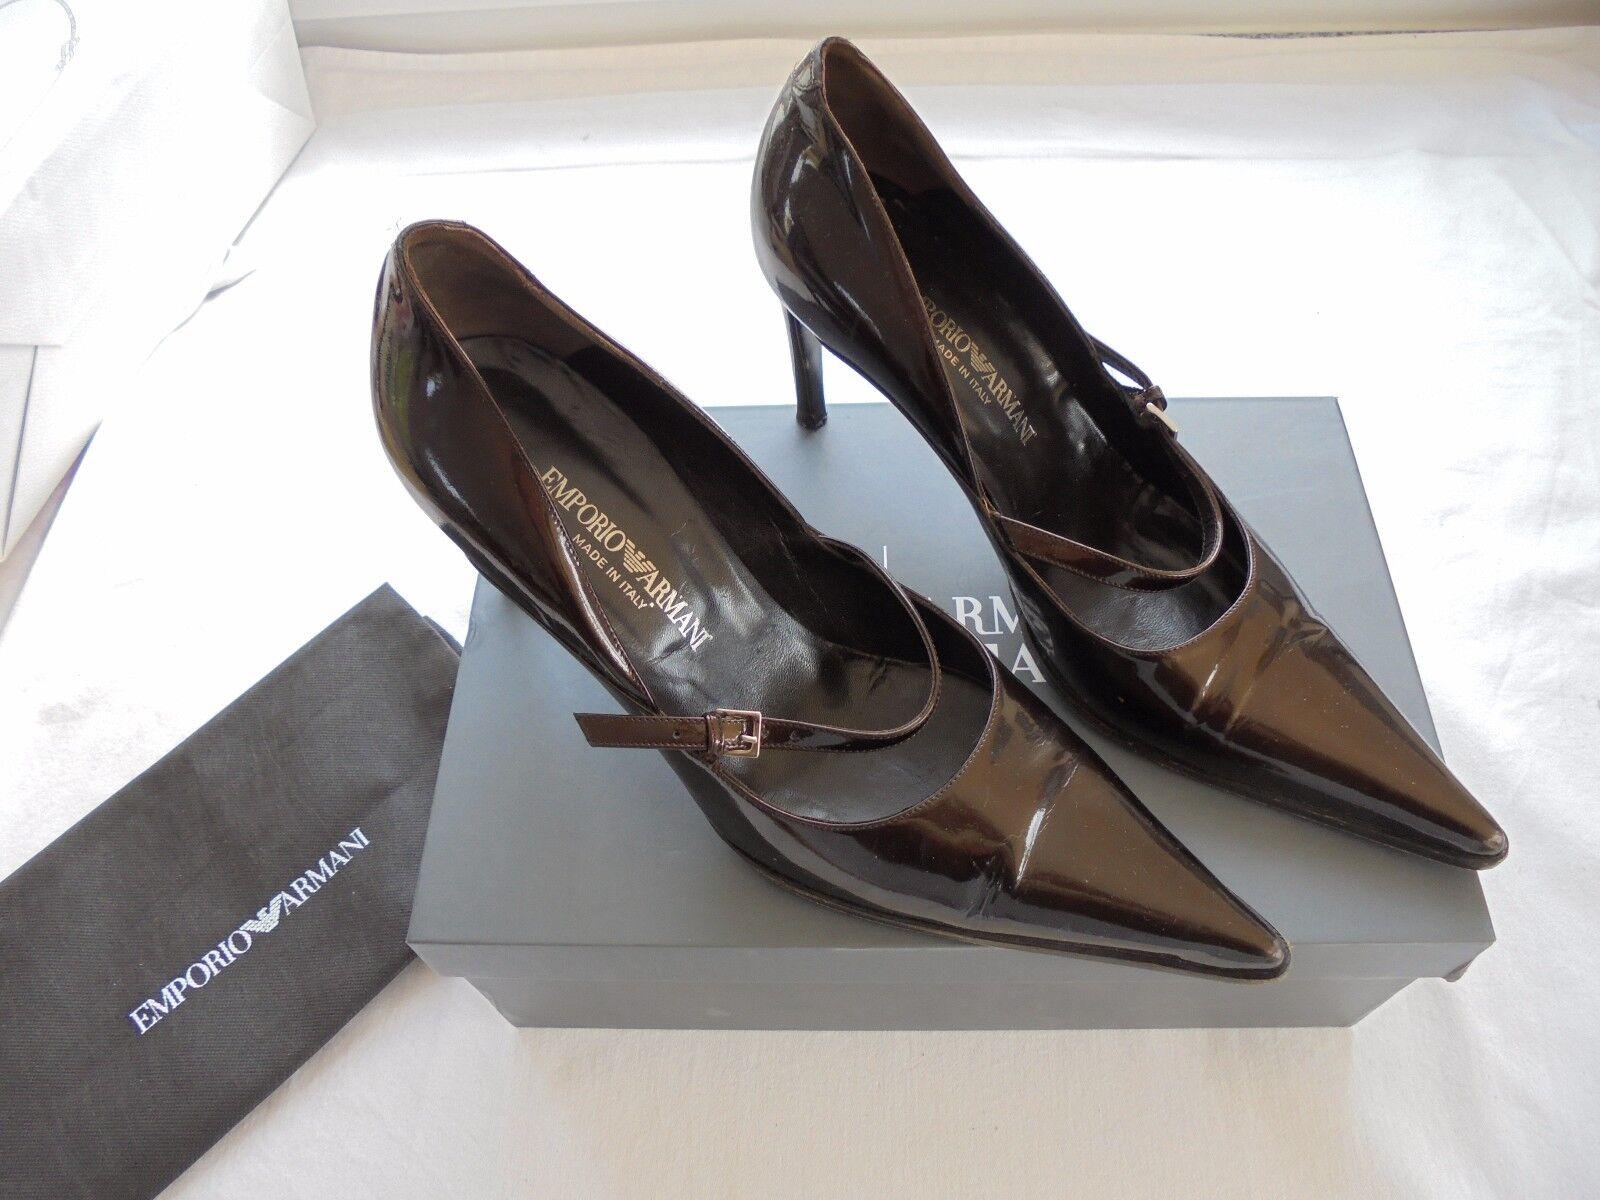 Emporio Armani Lackleder Pumps High NP  TOP Designer High Pumps Heels Schuhe Gr. 38 05c7e0